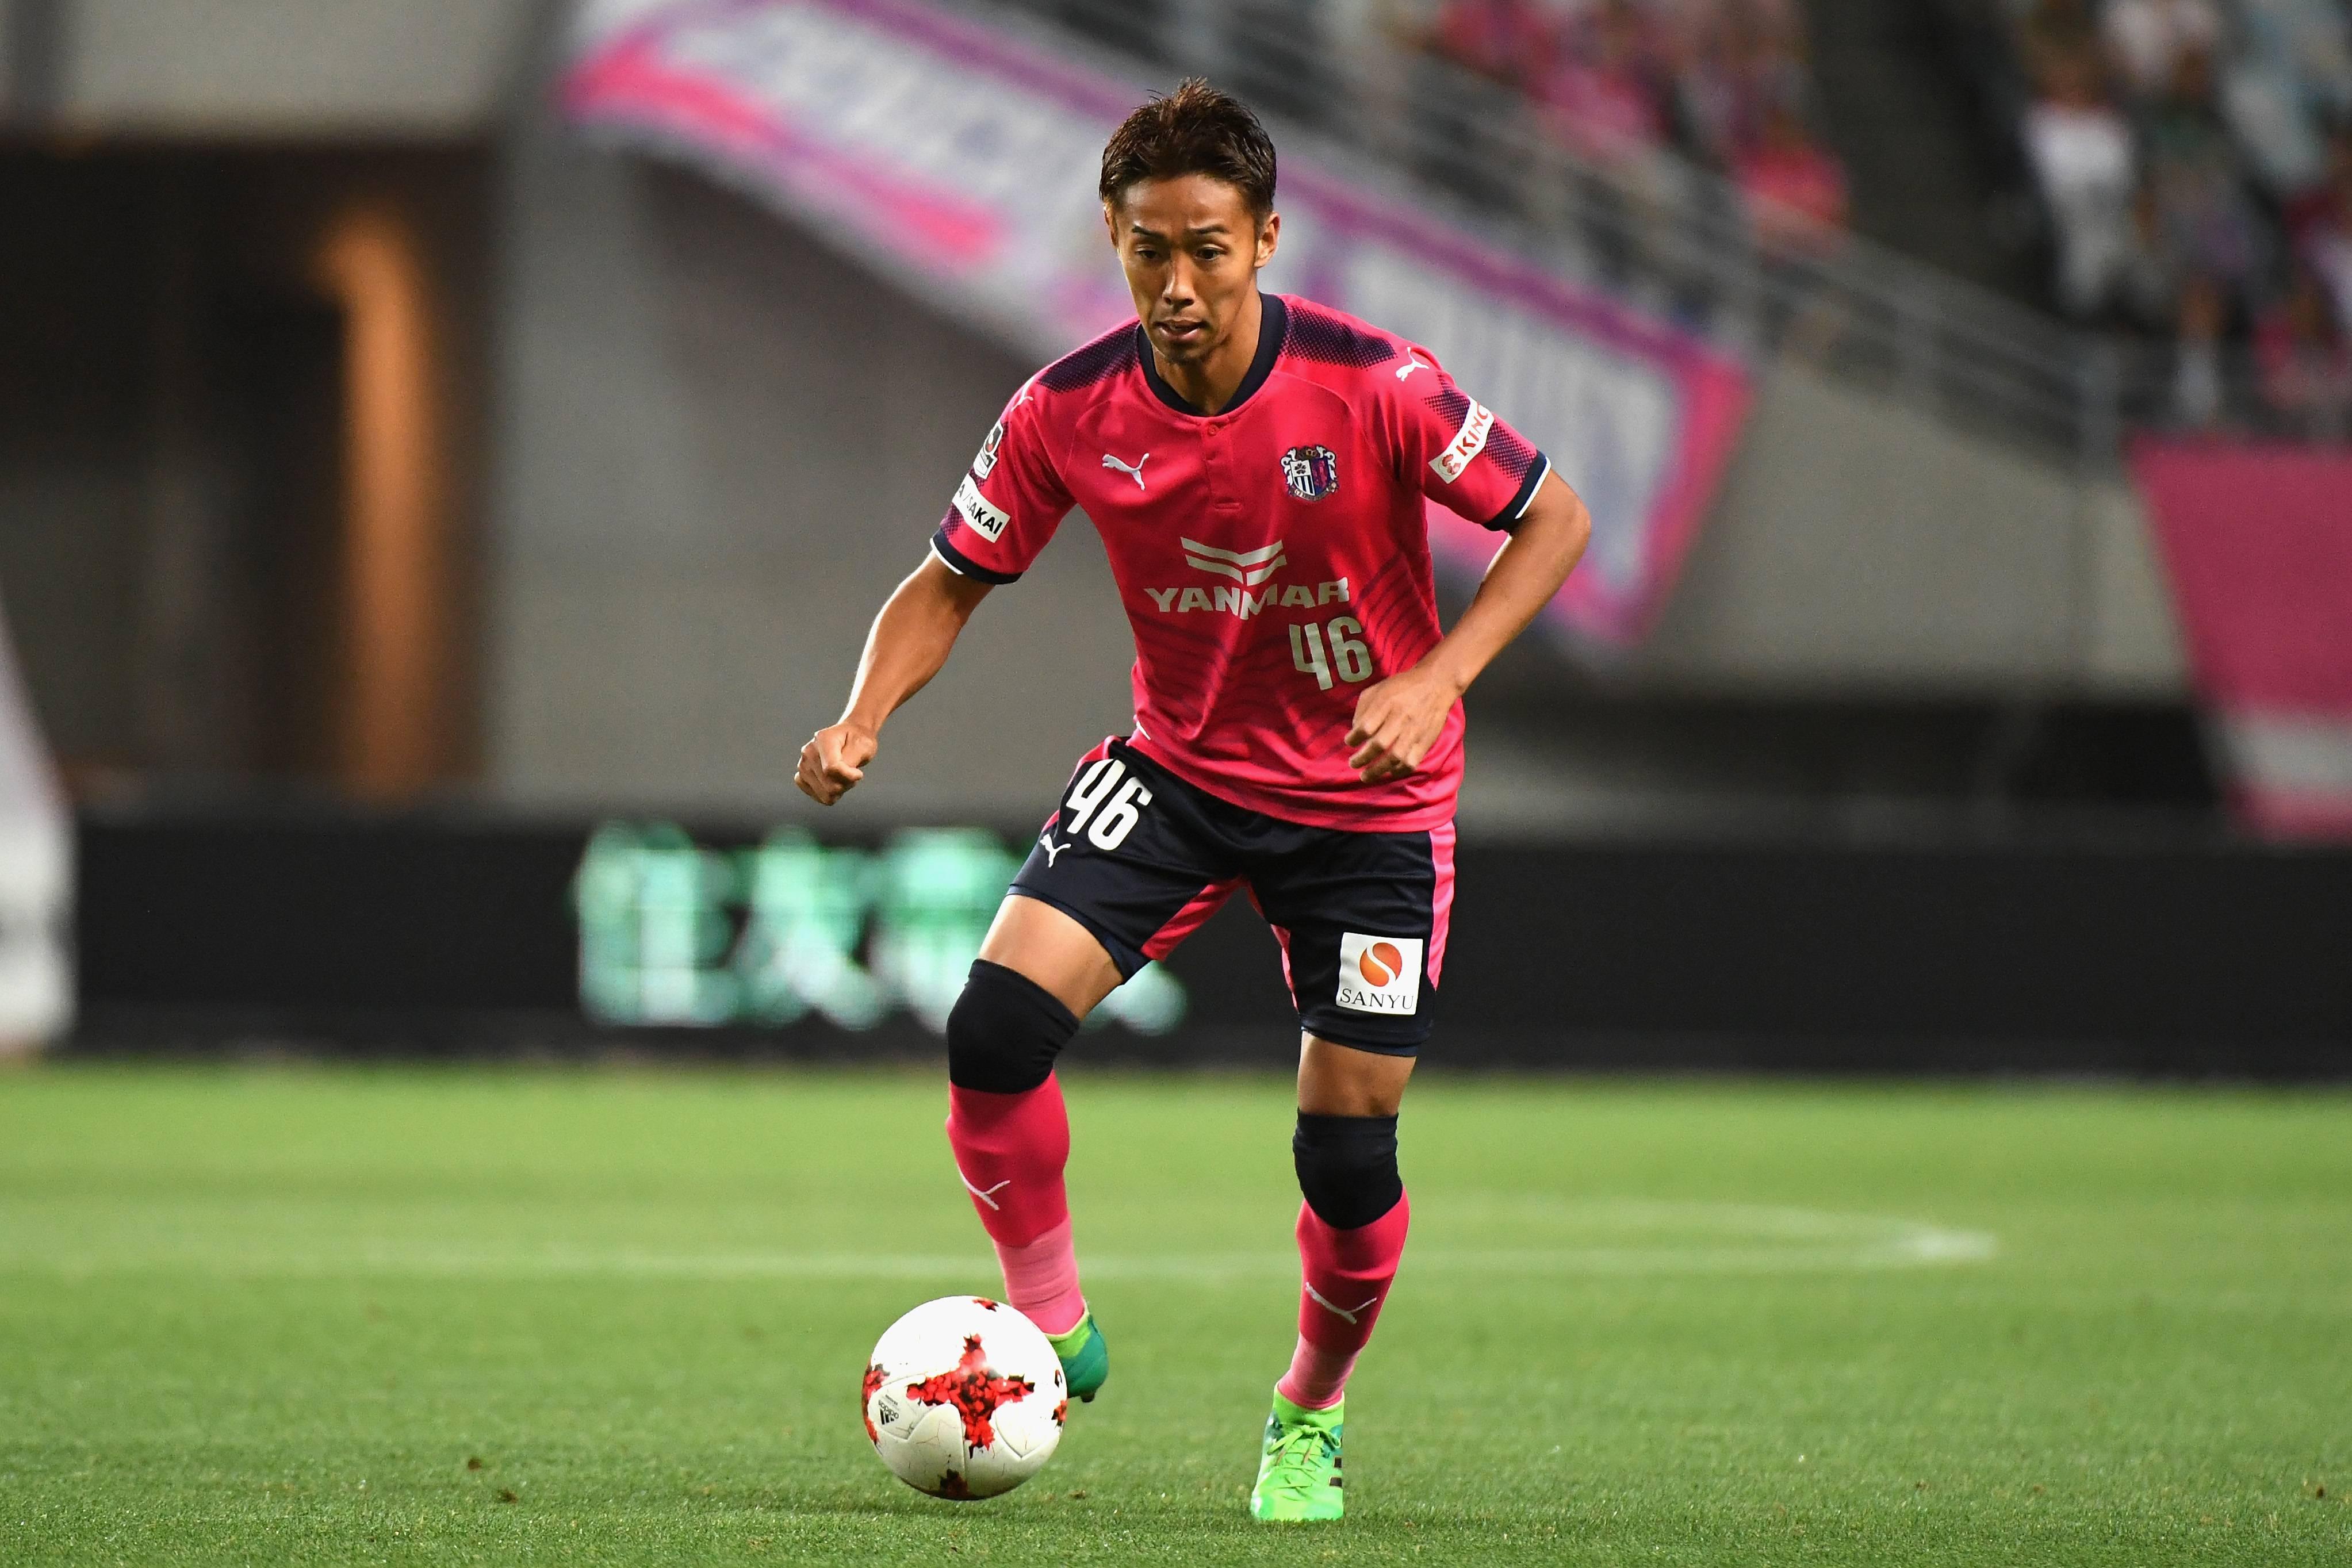 Hiroshi Kiyotake's World Cup chances threatened by calf injury